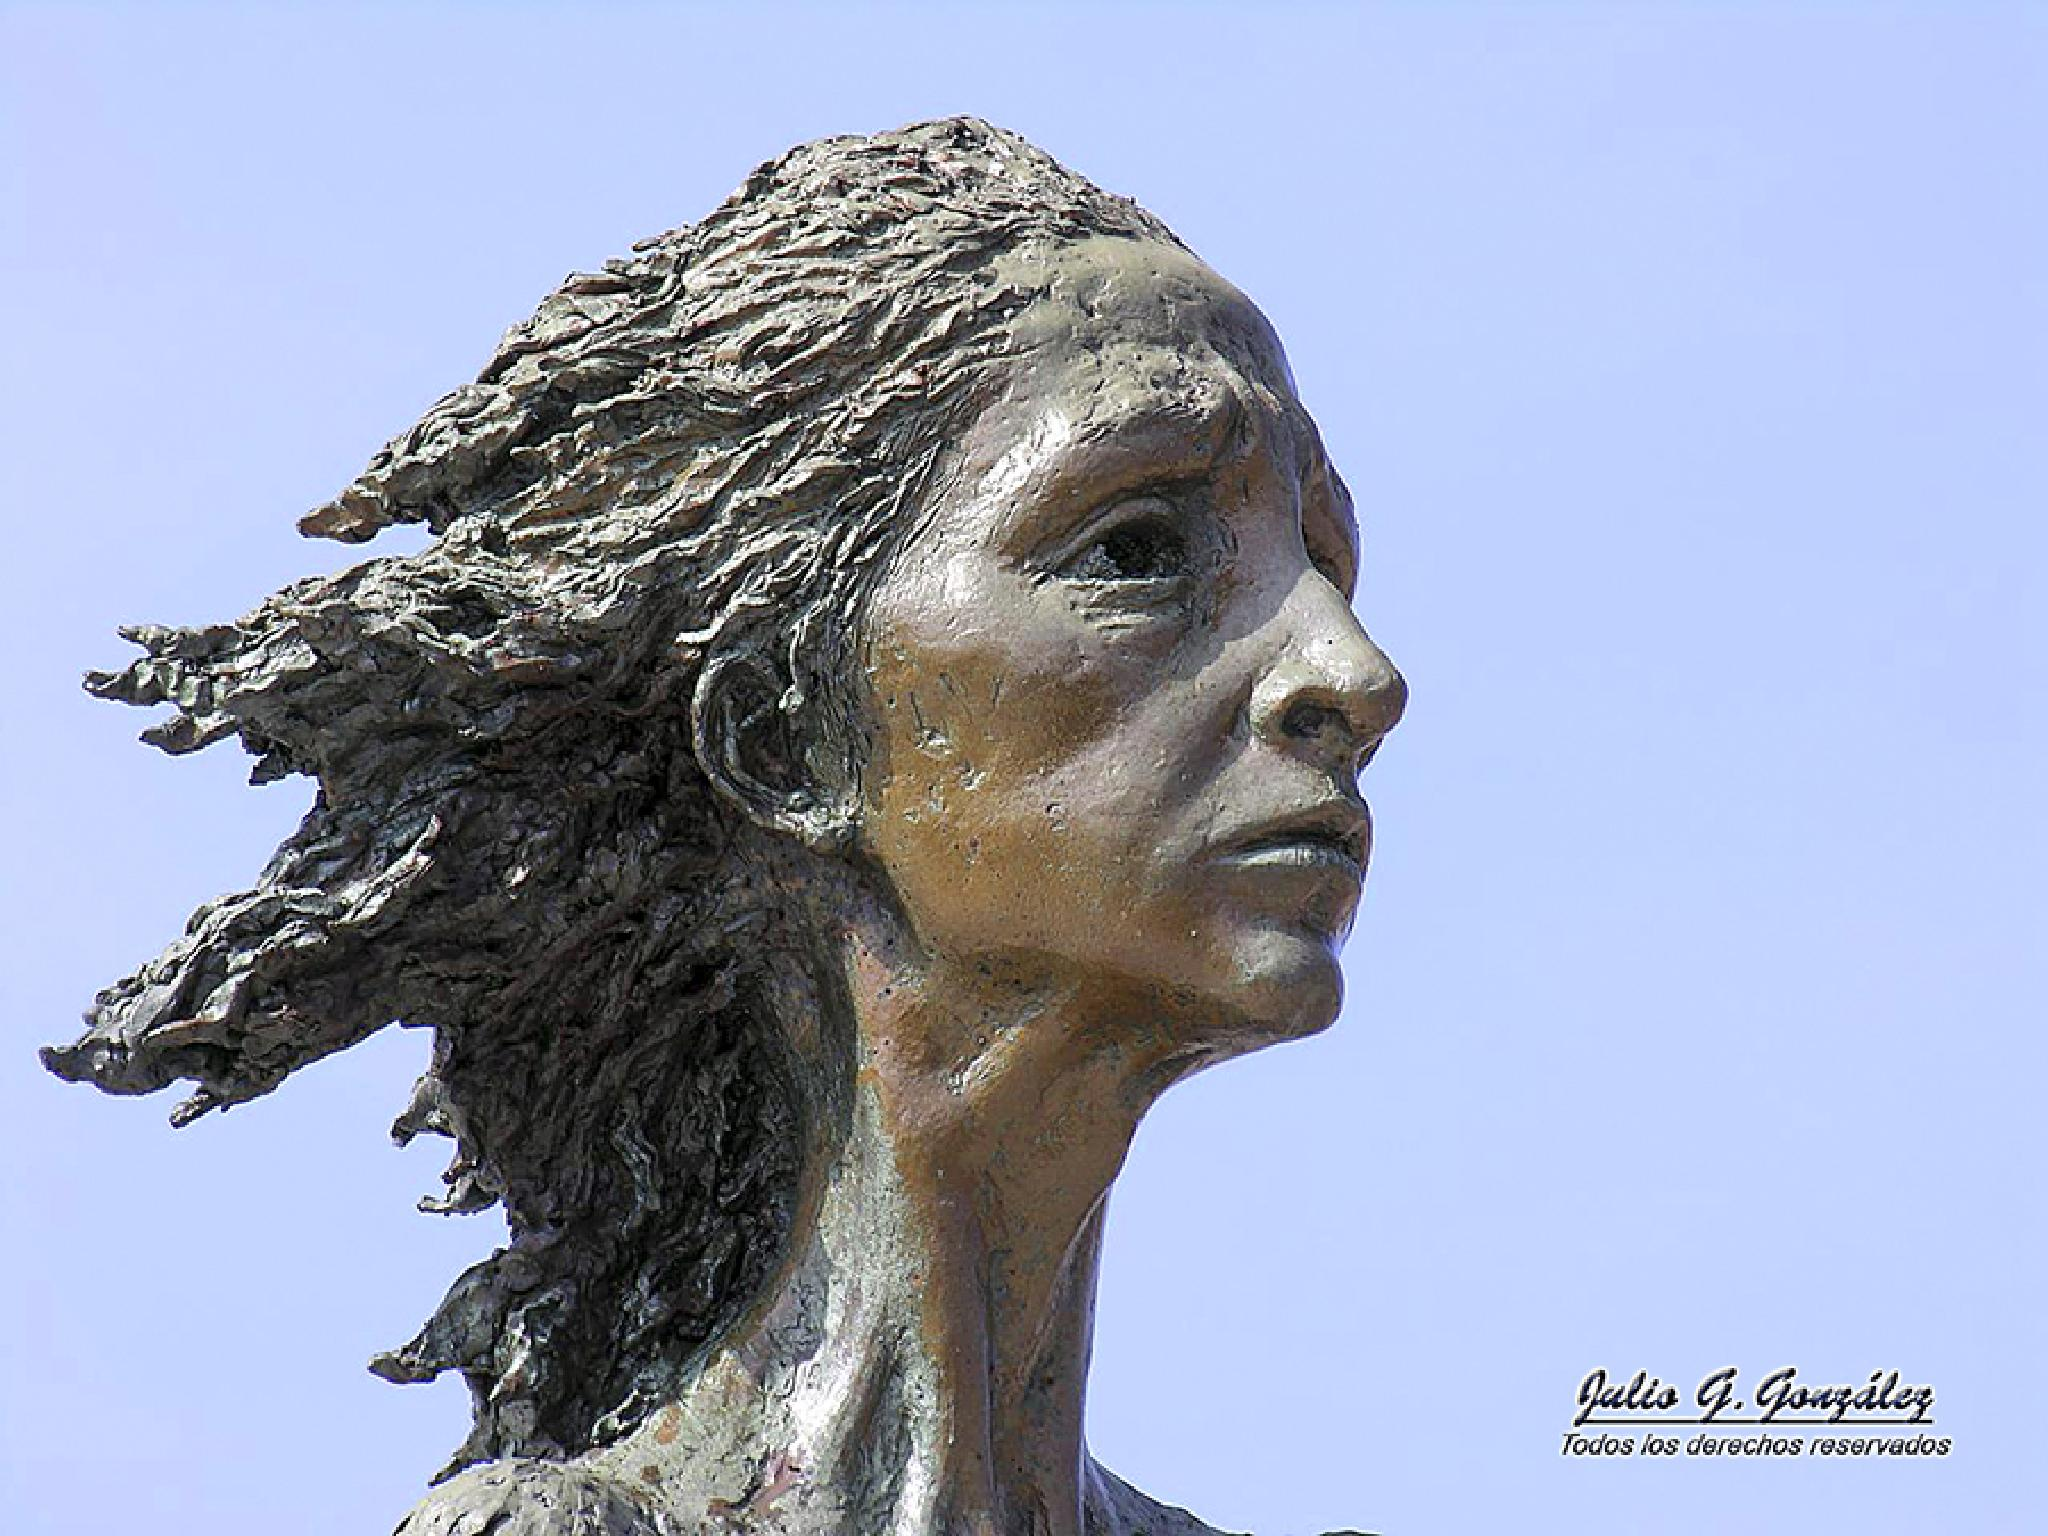 La madre del emigrante by Julio G.González